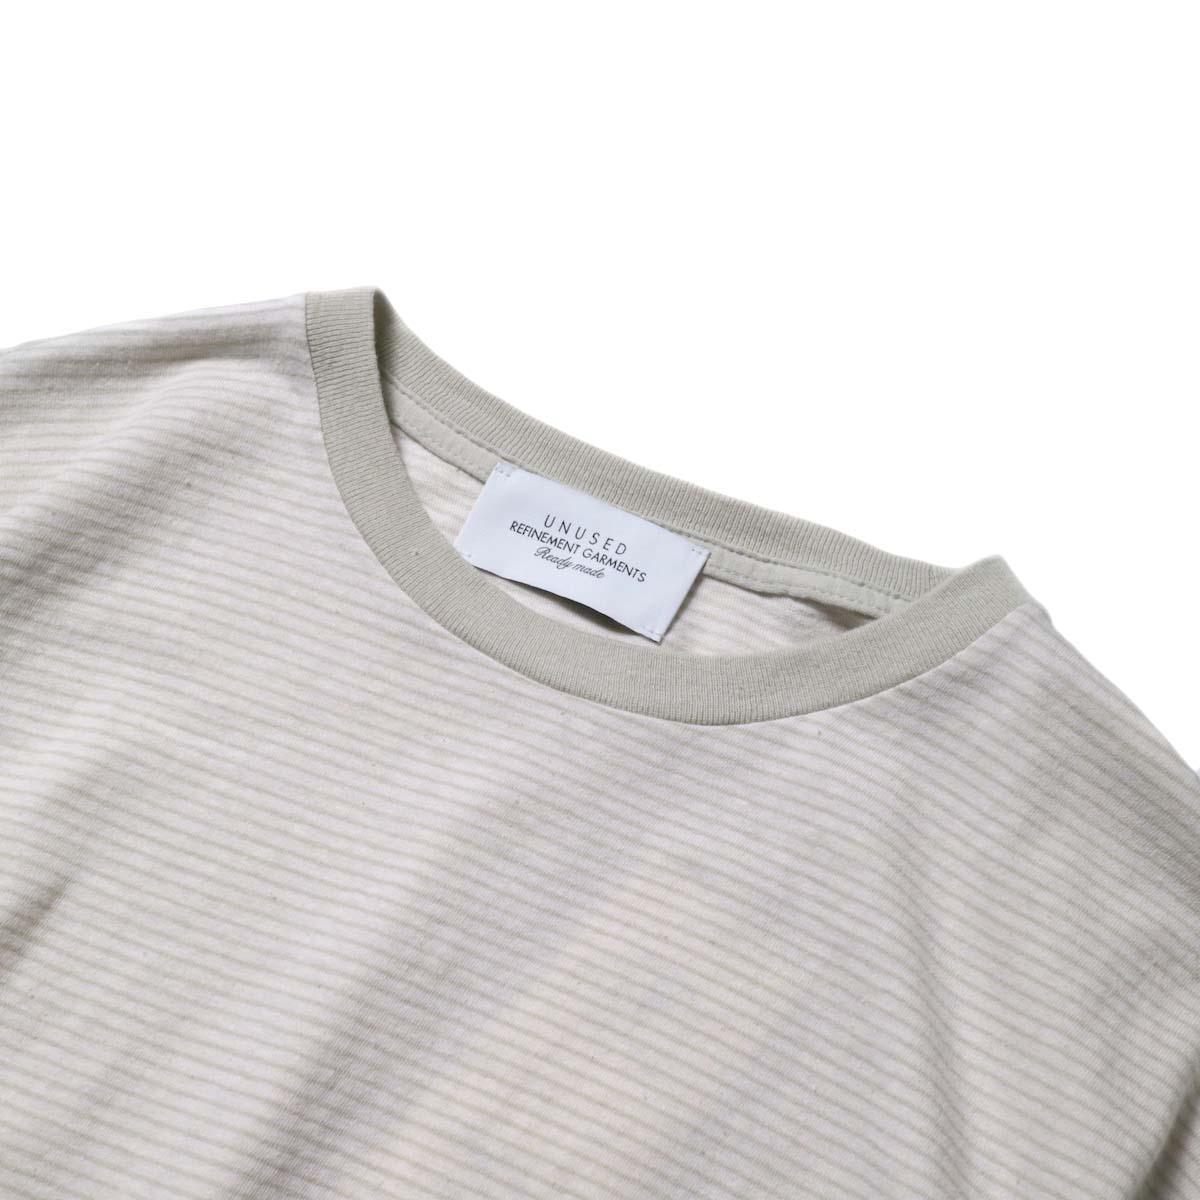 UNUSED / US1963 Short sleeve border t-shirt. (Pink × Beige)ネック